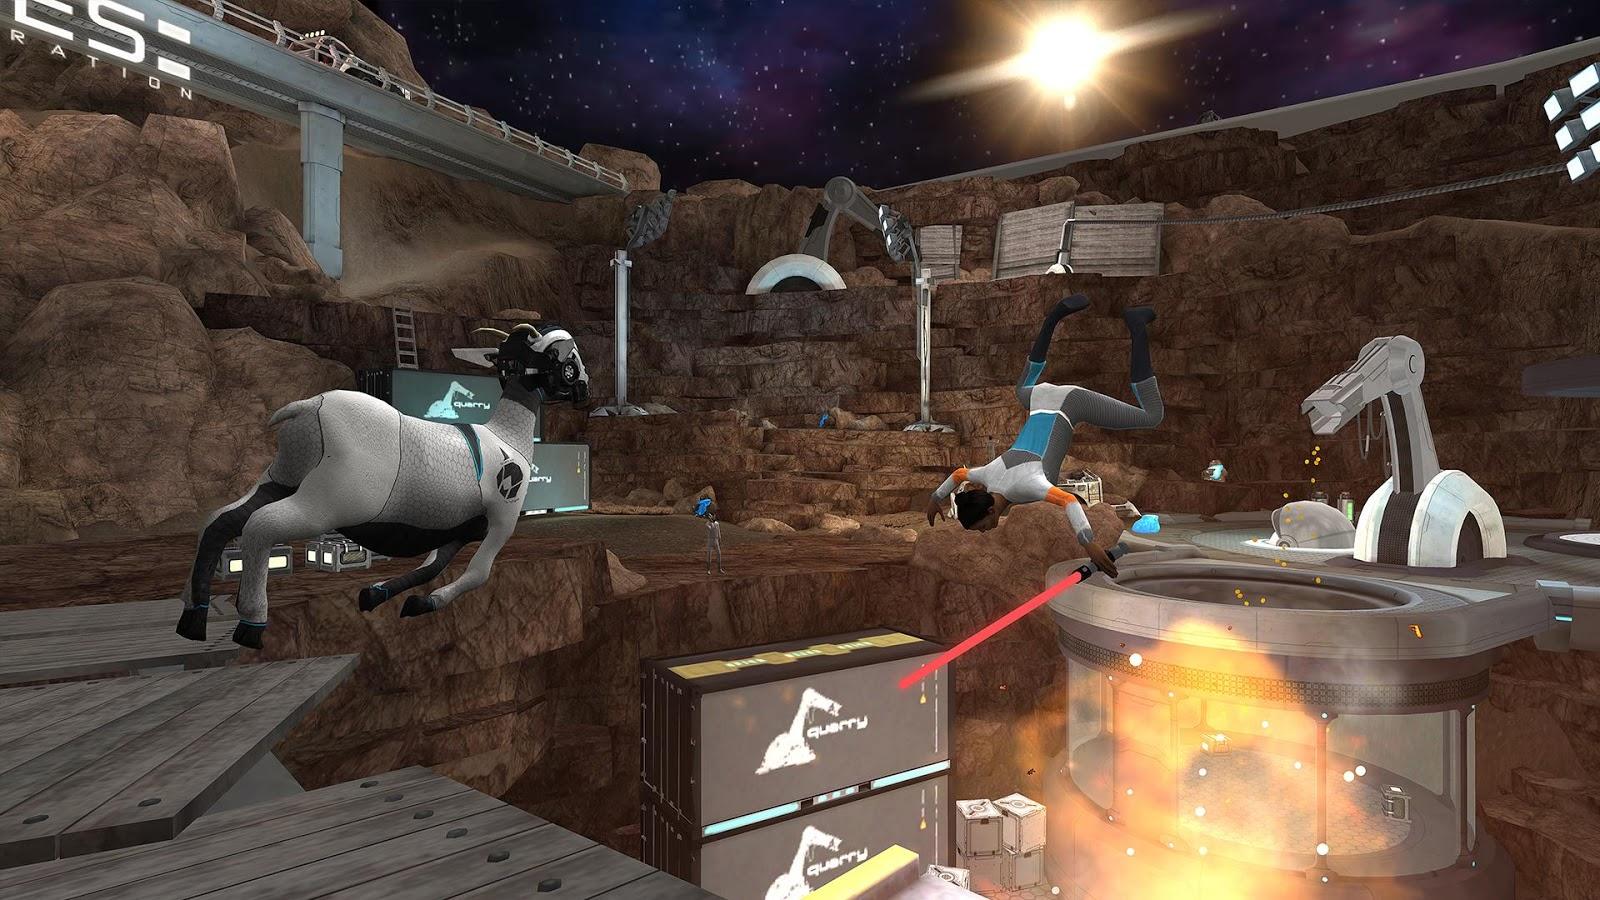 Скачать на андроид симулятор апокалипсиса